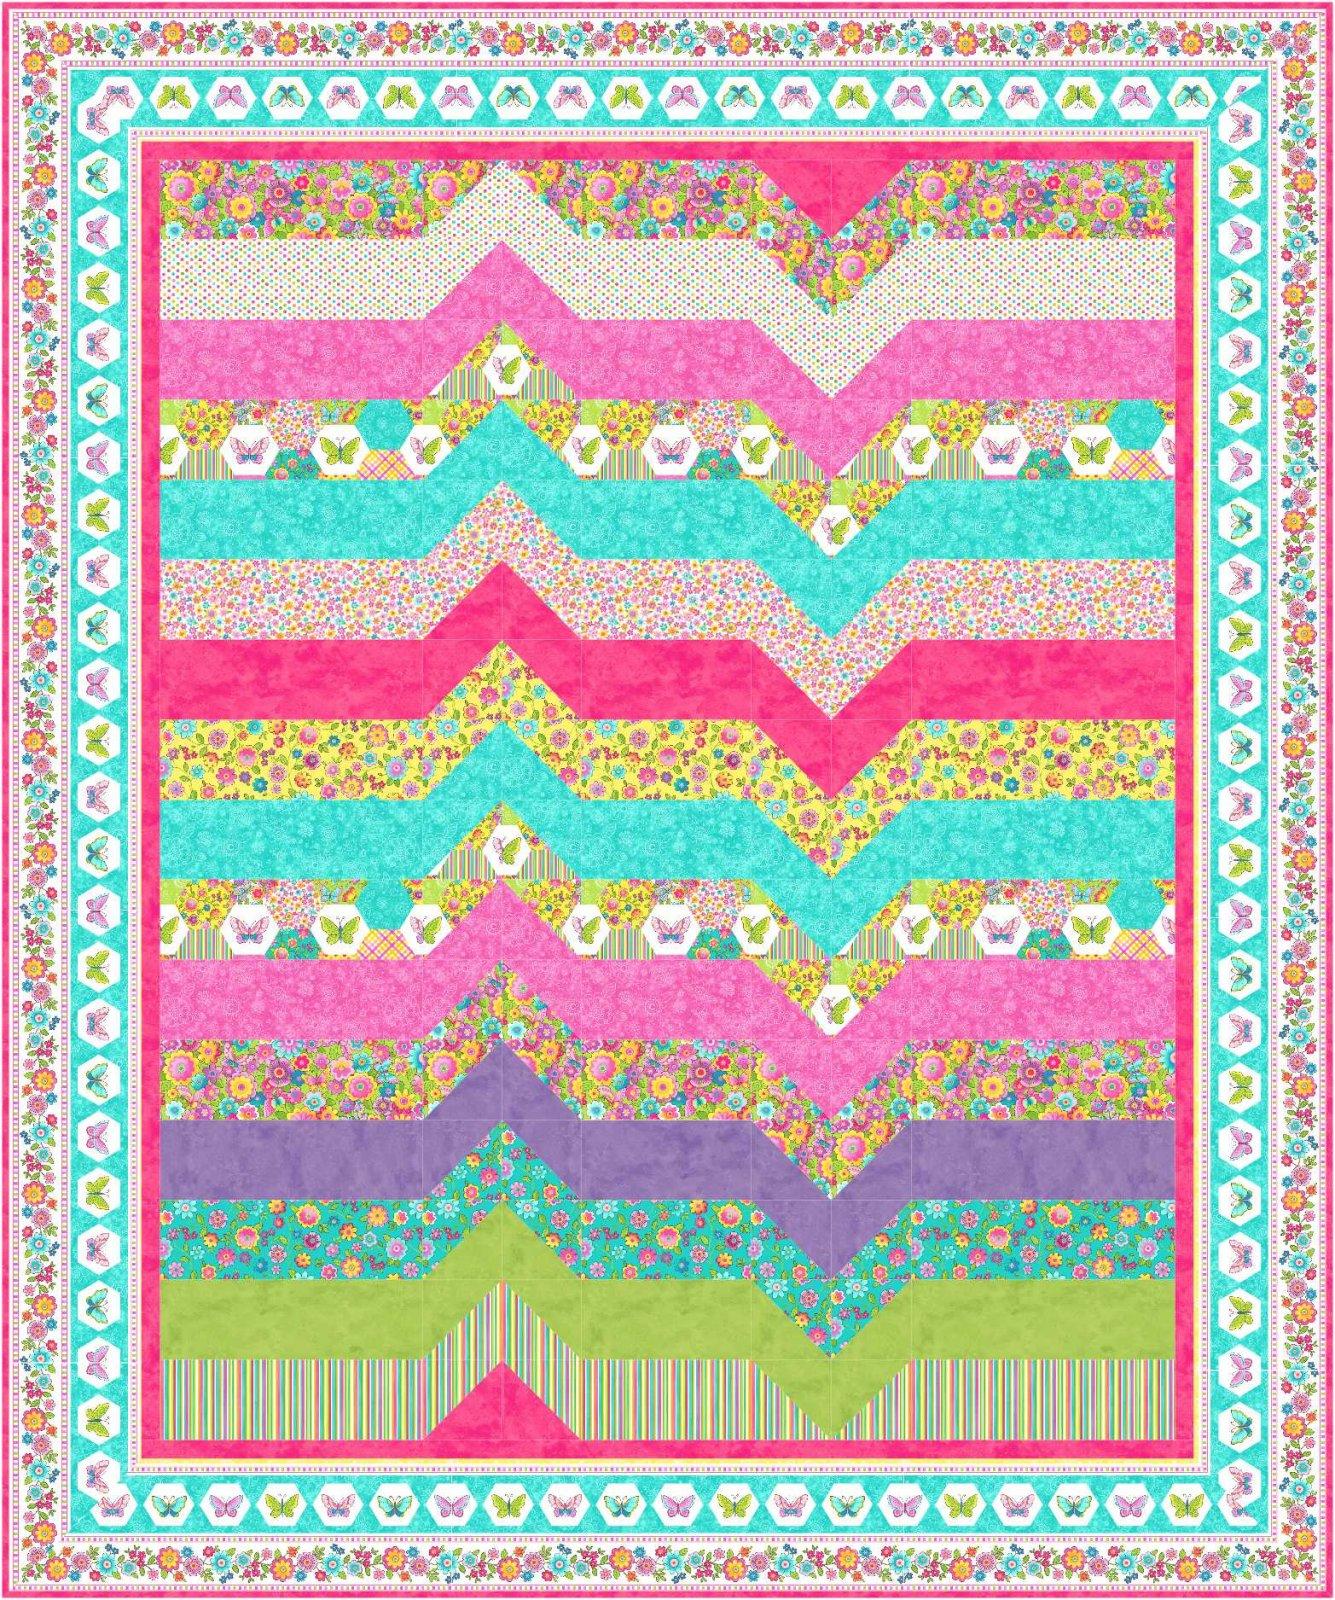 Heart Throb quilt pattern - downloadable